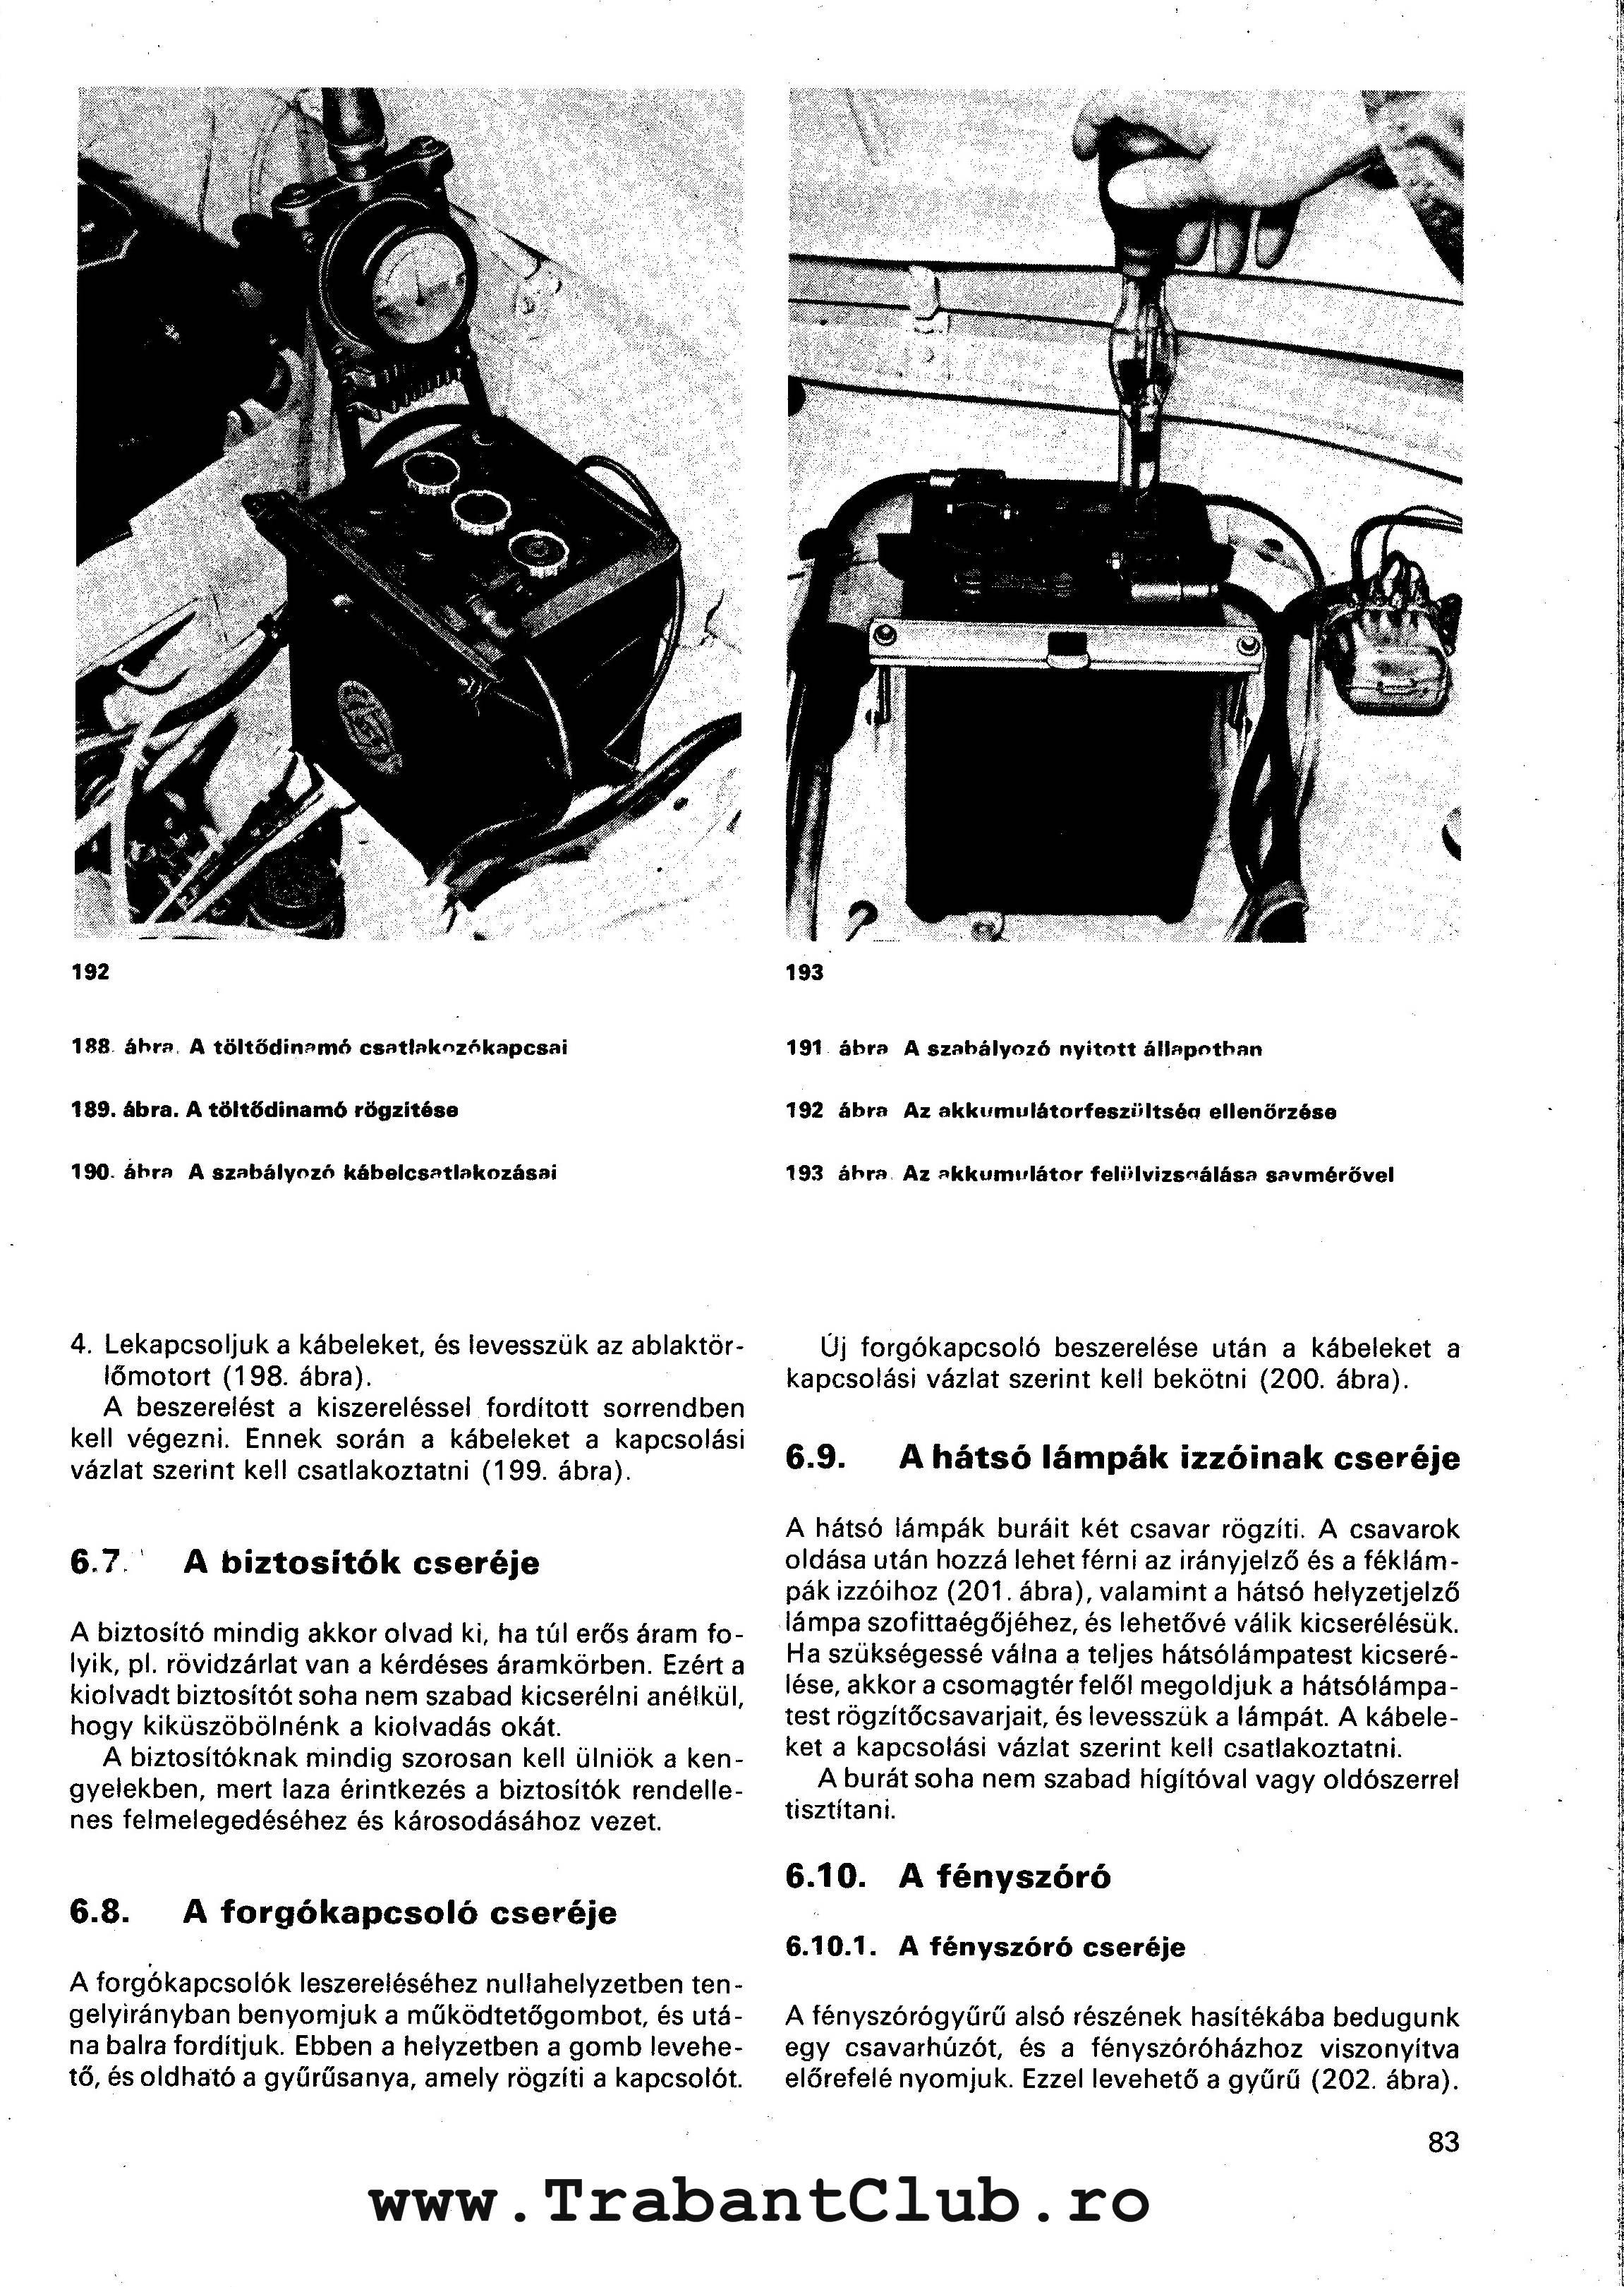 TRABANT 601 Javitasi Segedkonyv085.jpg